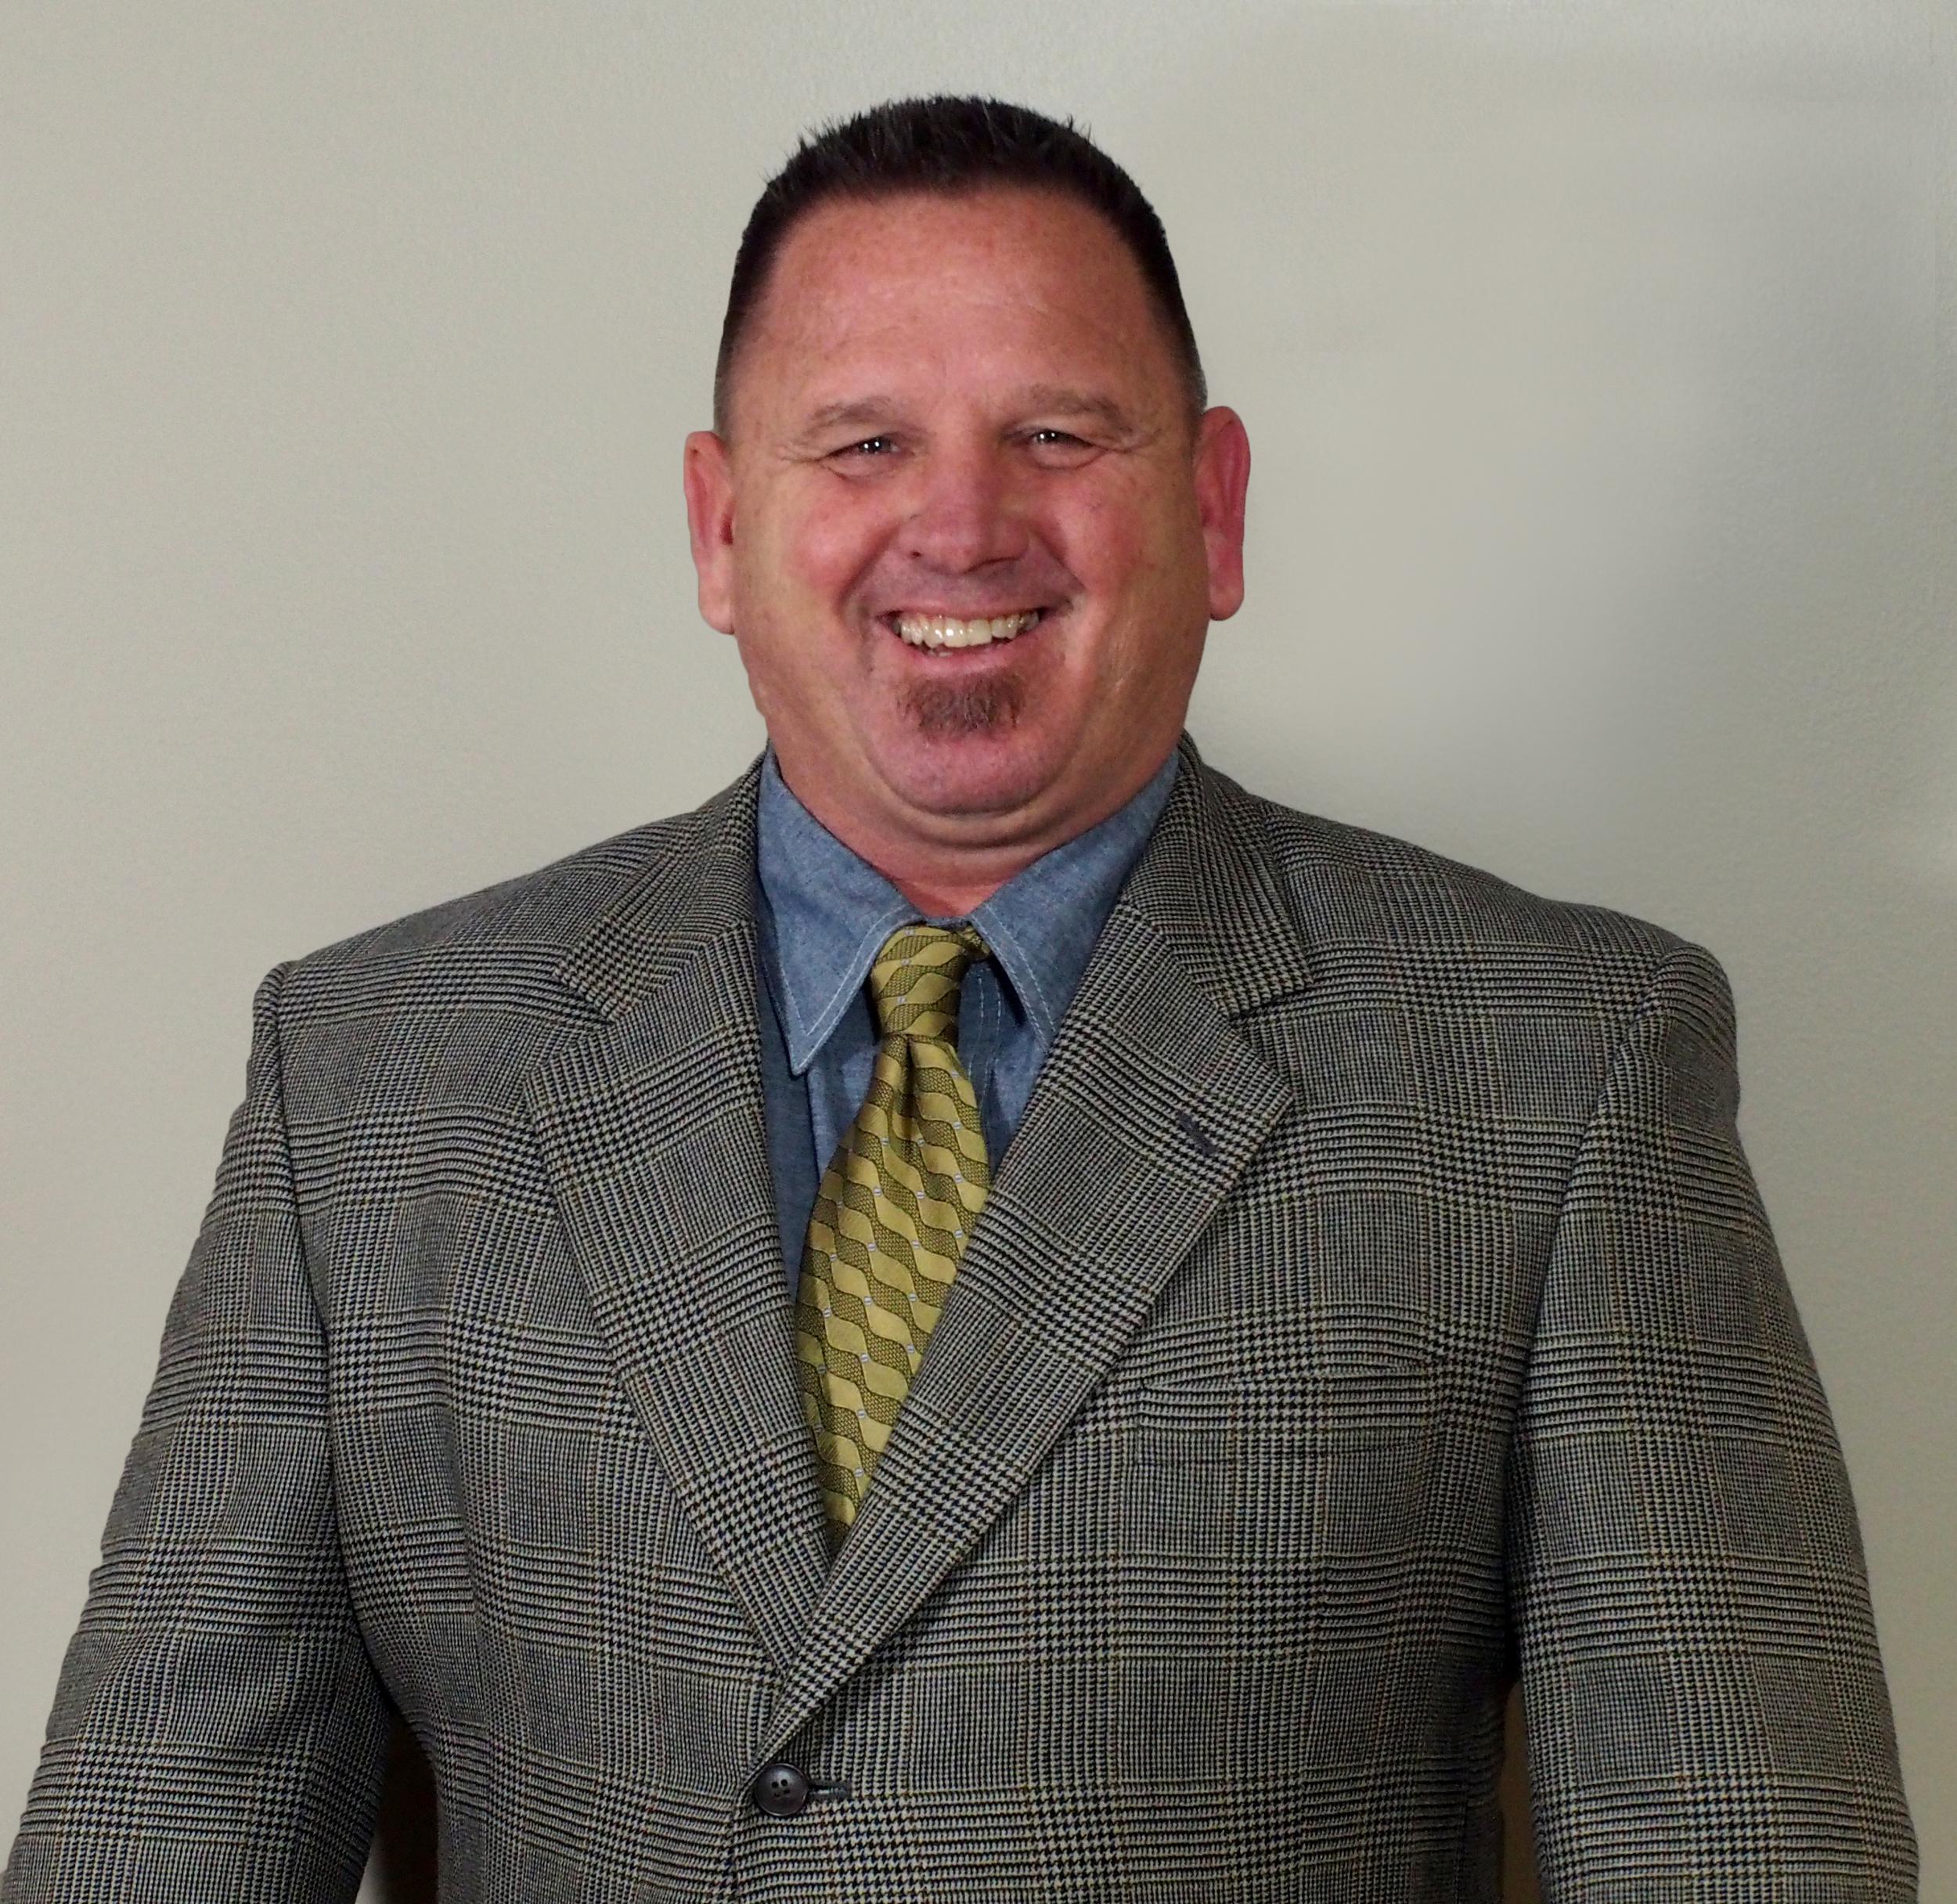 Rick Hennebaul - Territory Manager / Principal